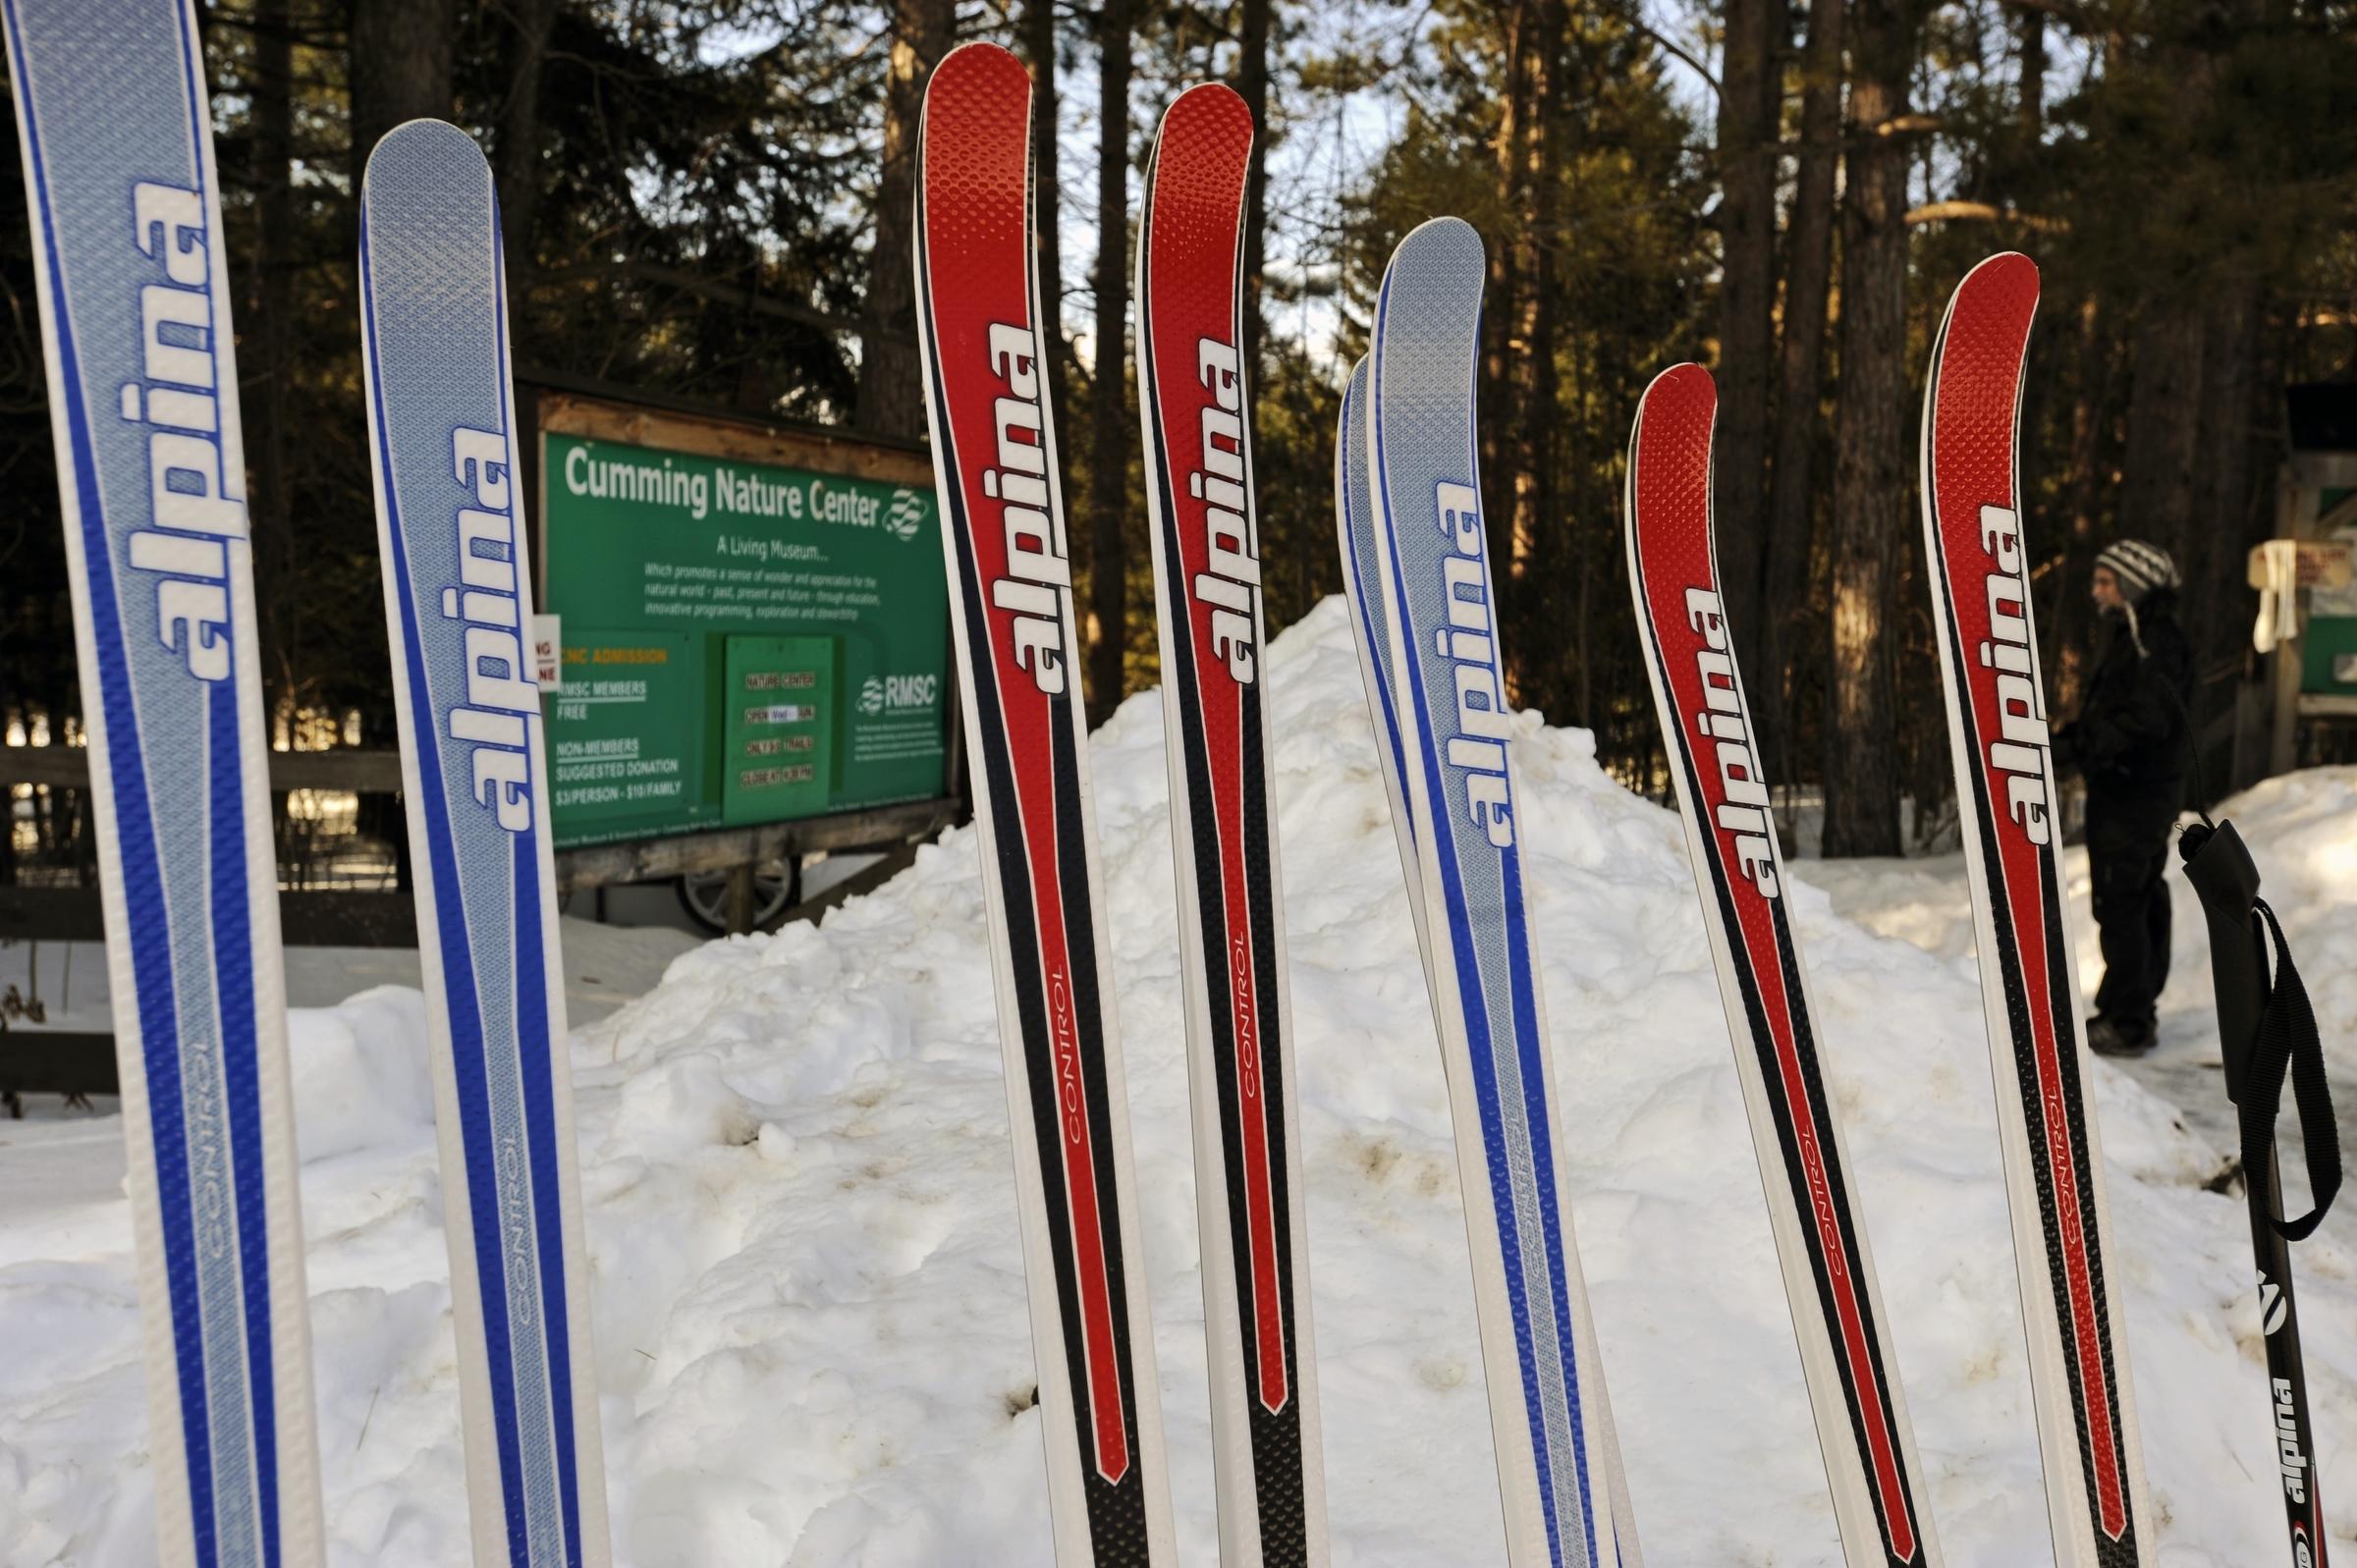 dog sledding & skijoring in ny | information & resources